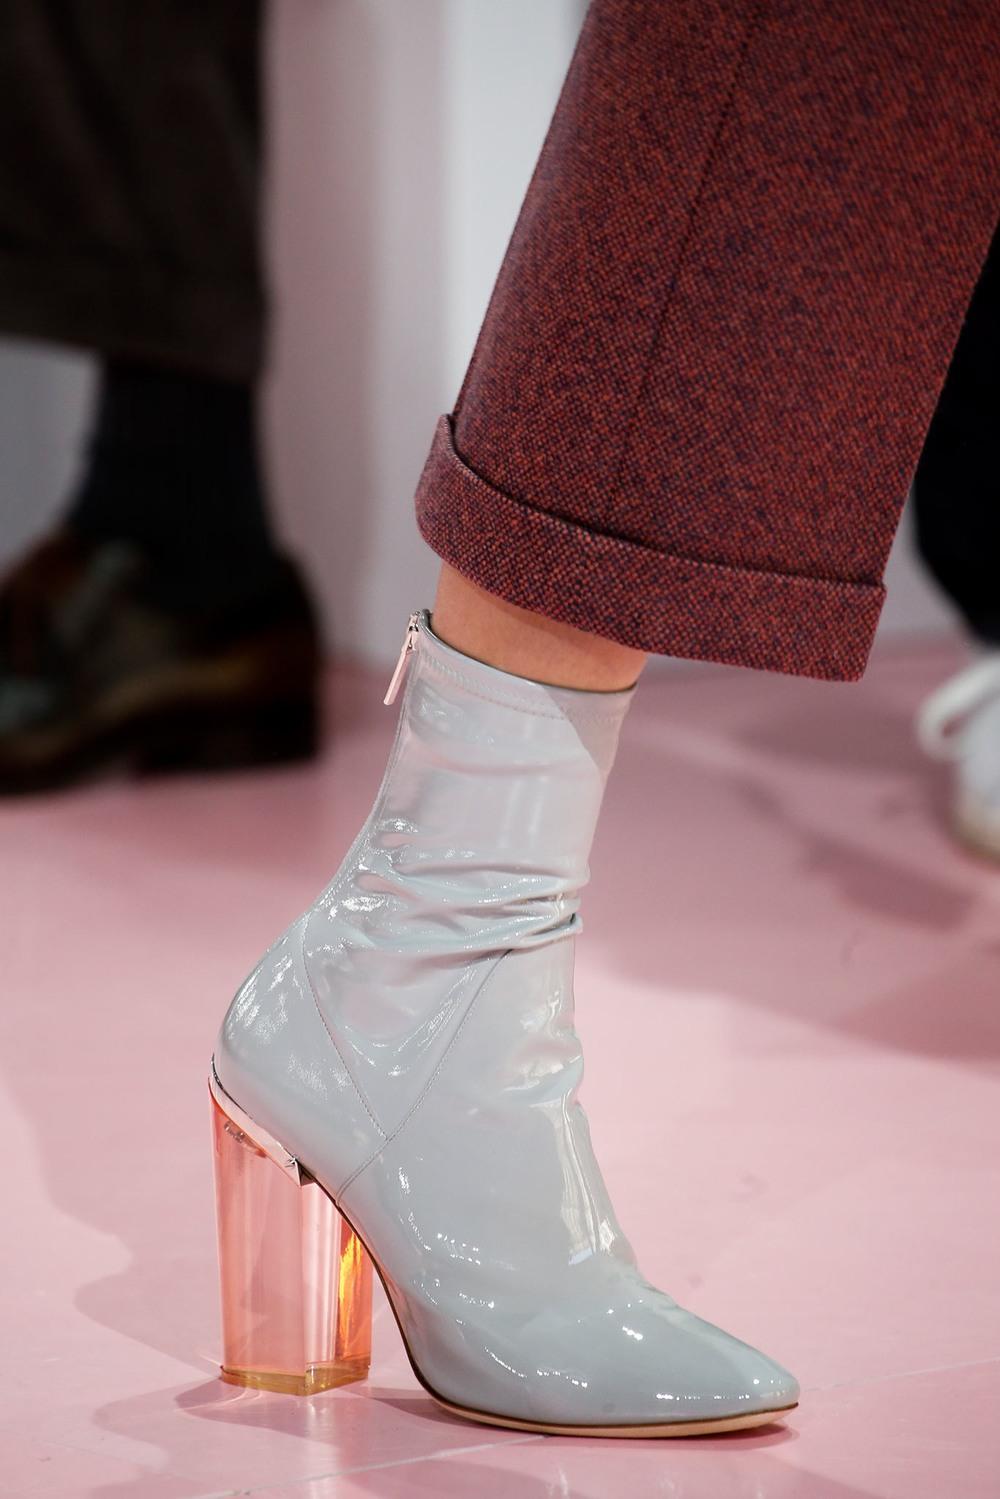 04-01-accessories-trends-fall-2015-lucite-heel.jpg